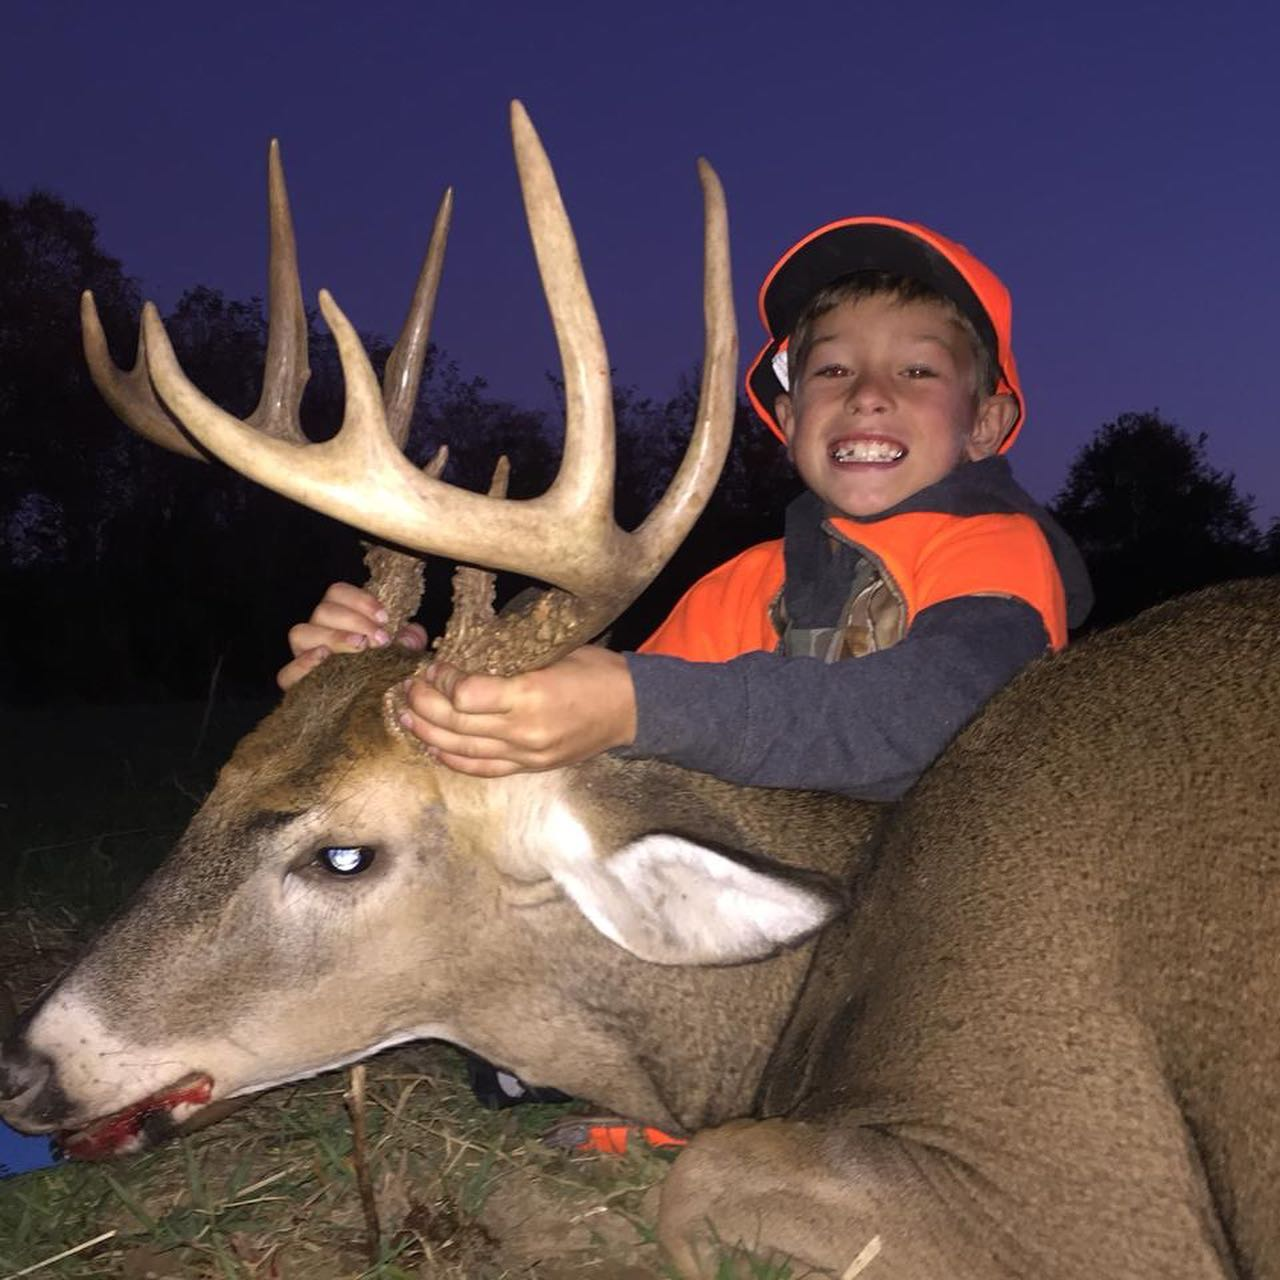 North Camp Ohio 2 Day 3 Night Shotgun Hunt - Youth Weekend